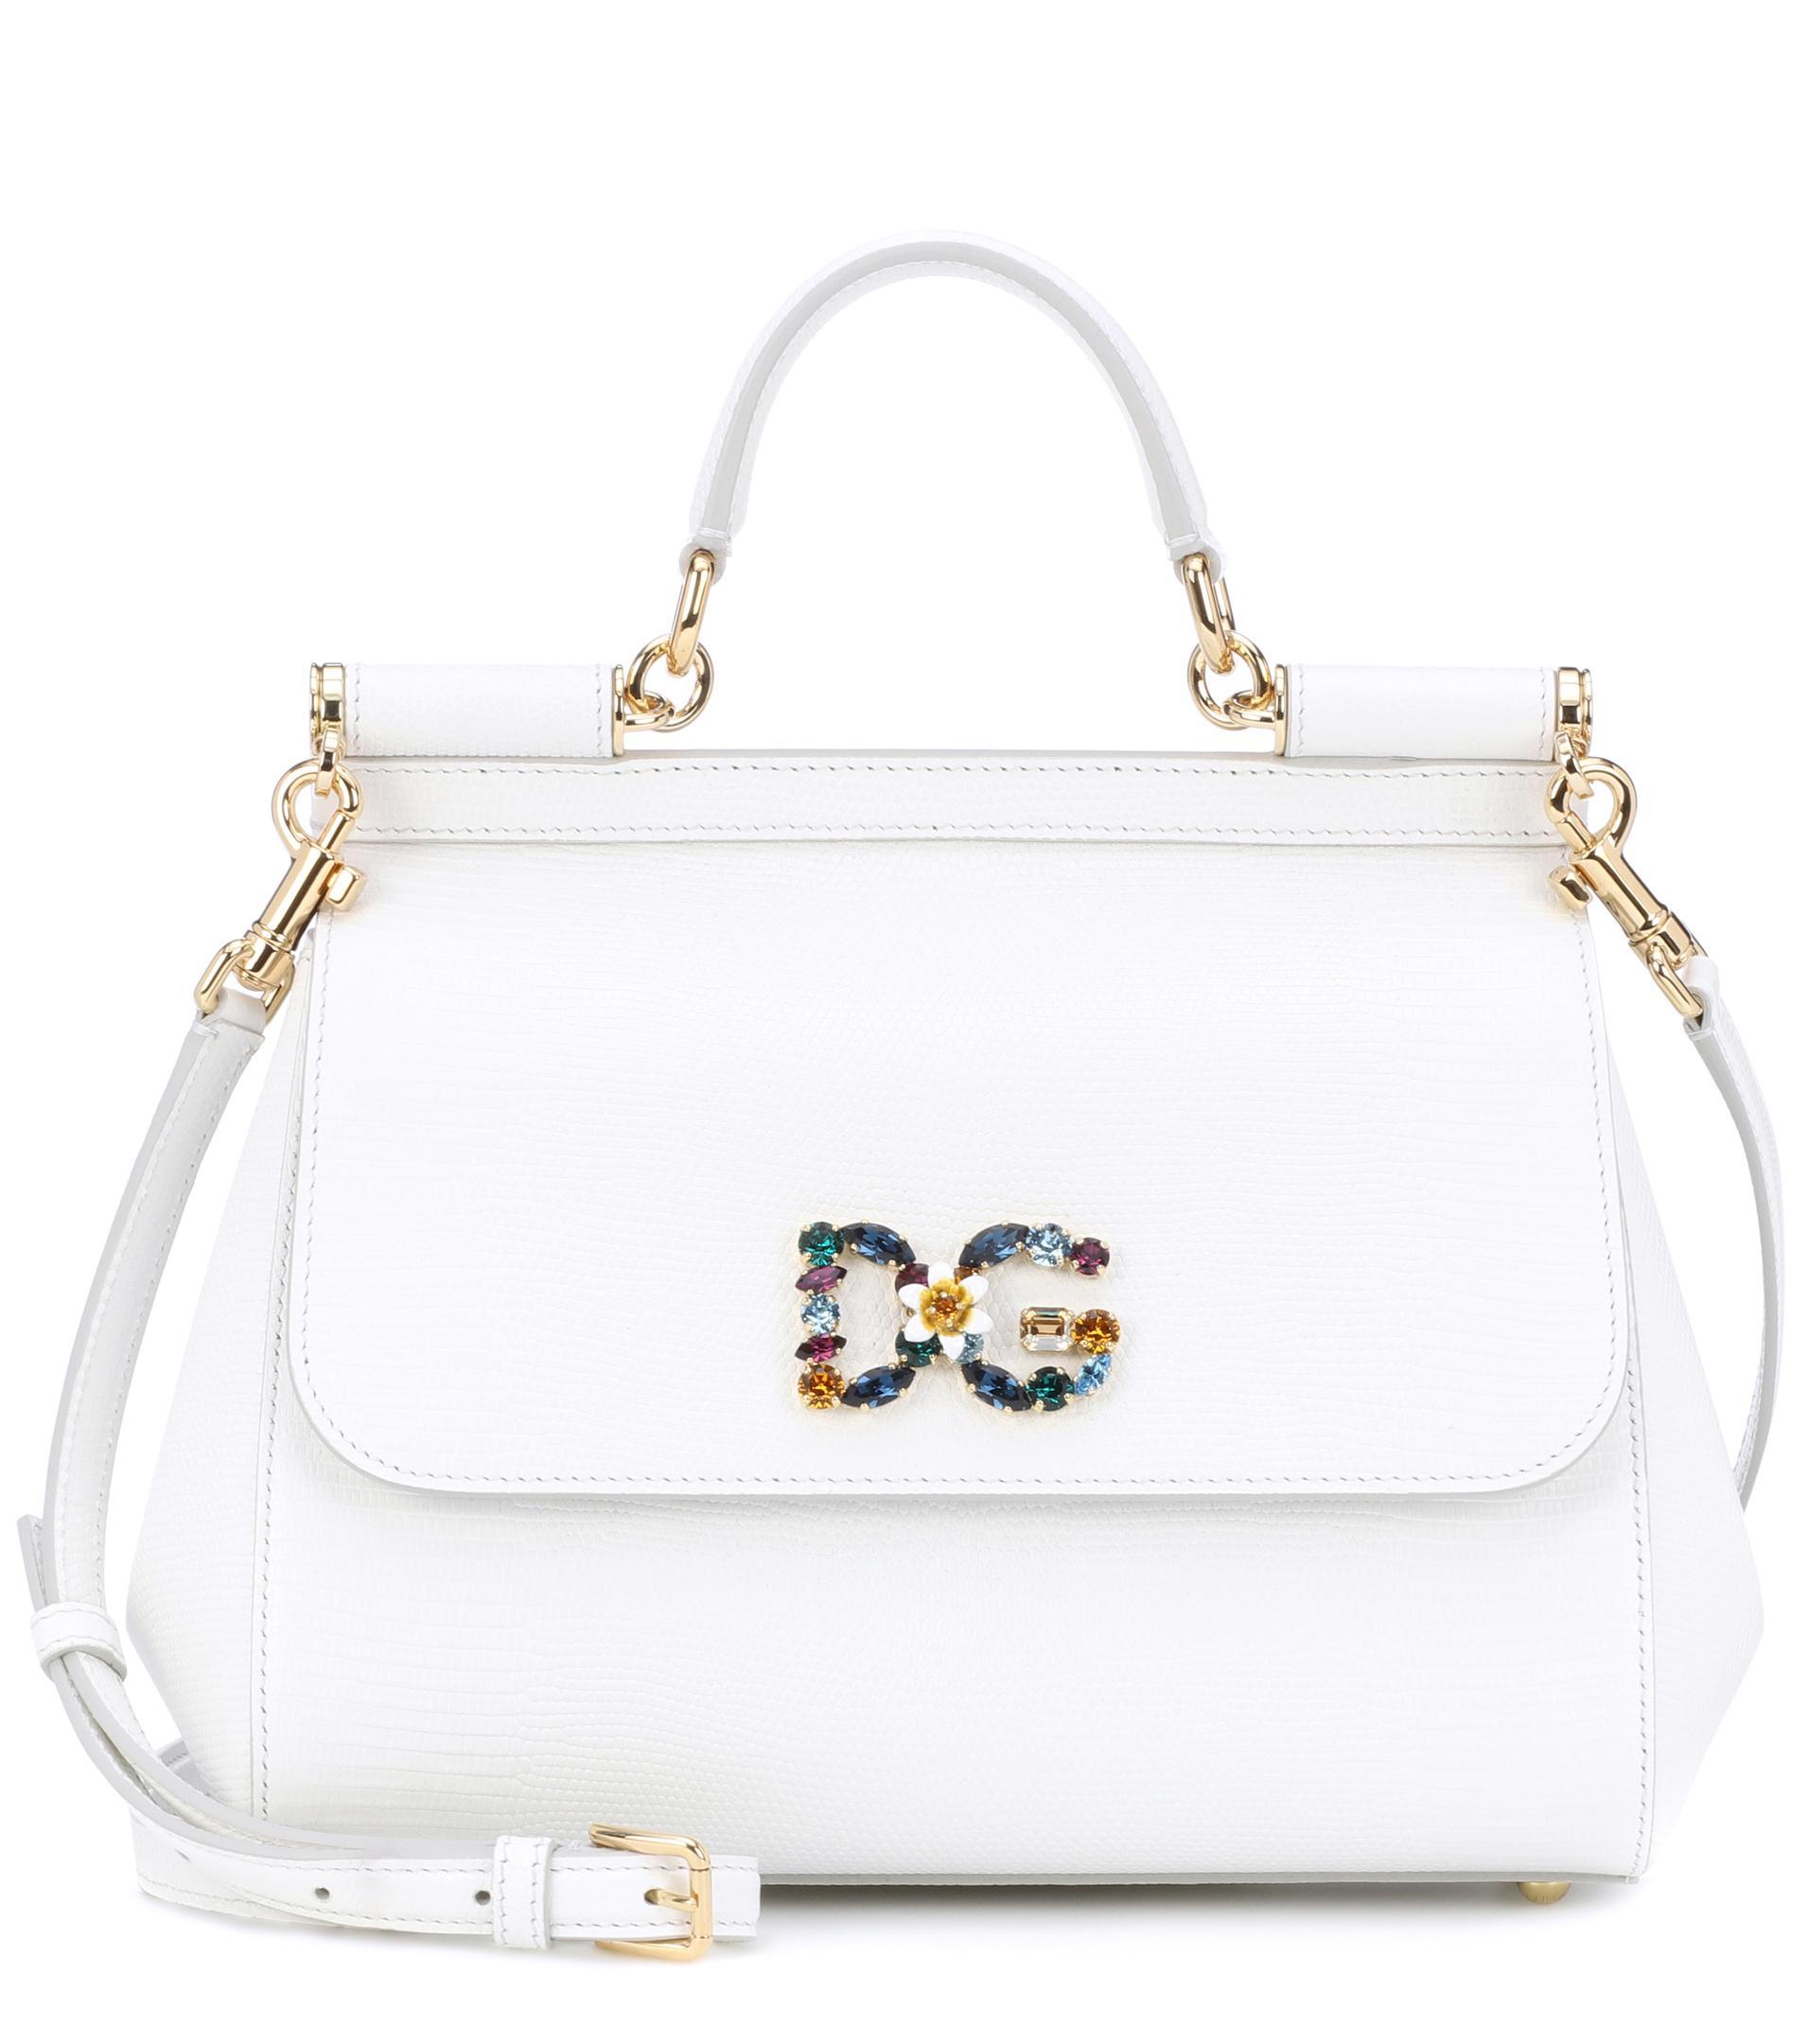 c5e2c6a17bff Dolce   Gabbana Sicily Medium Leather Shoulder Bag in White - Lyst